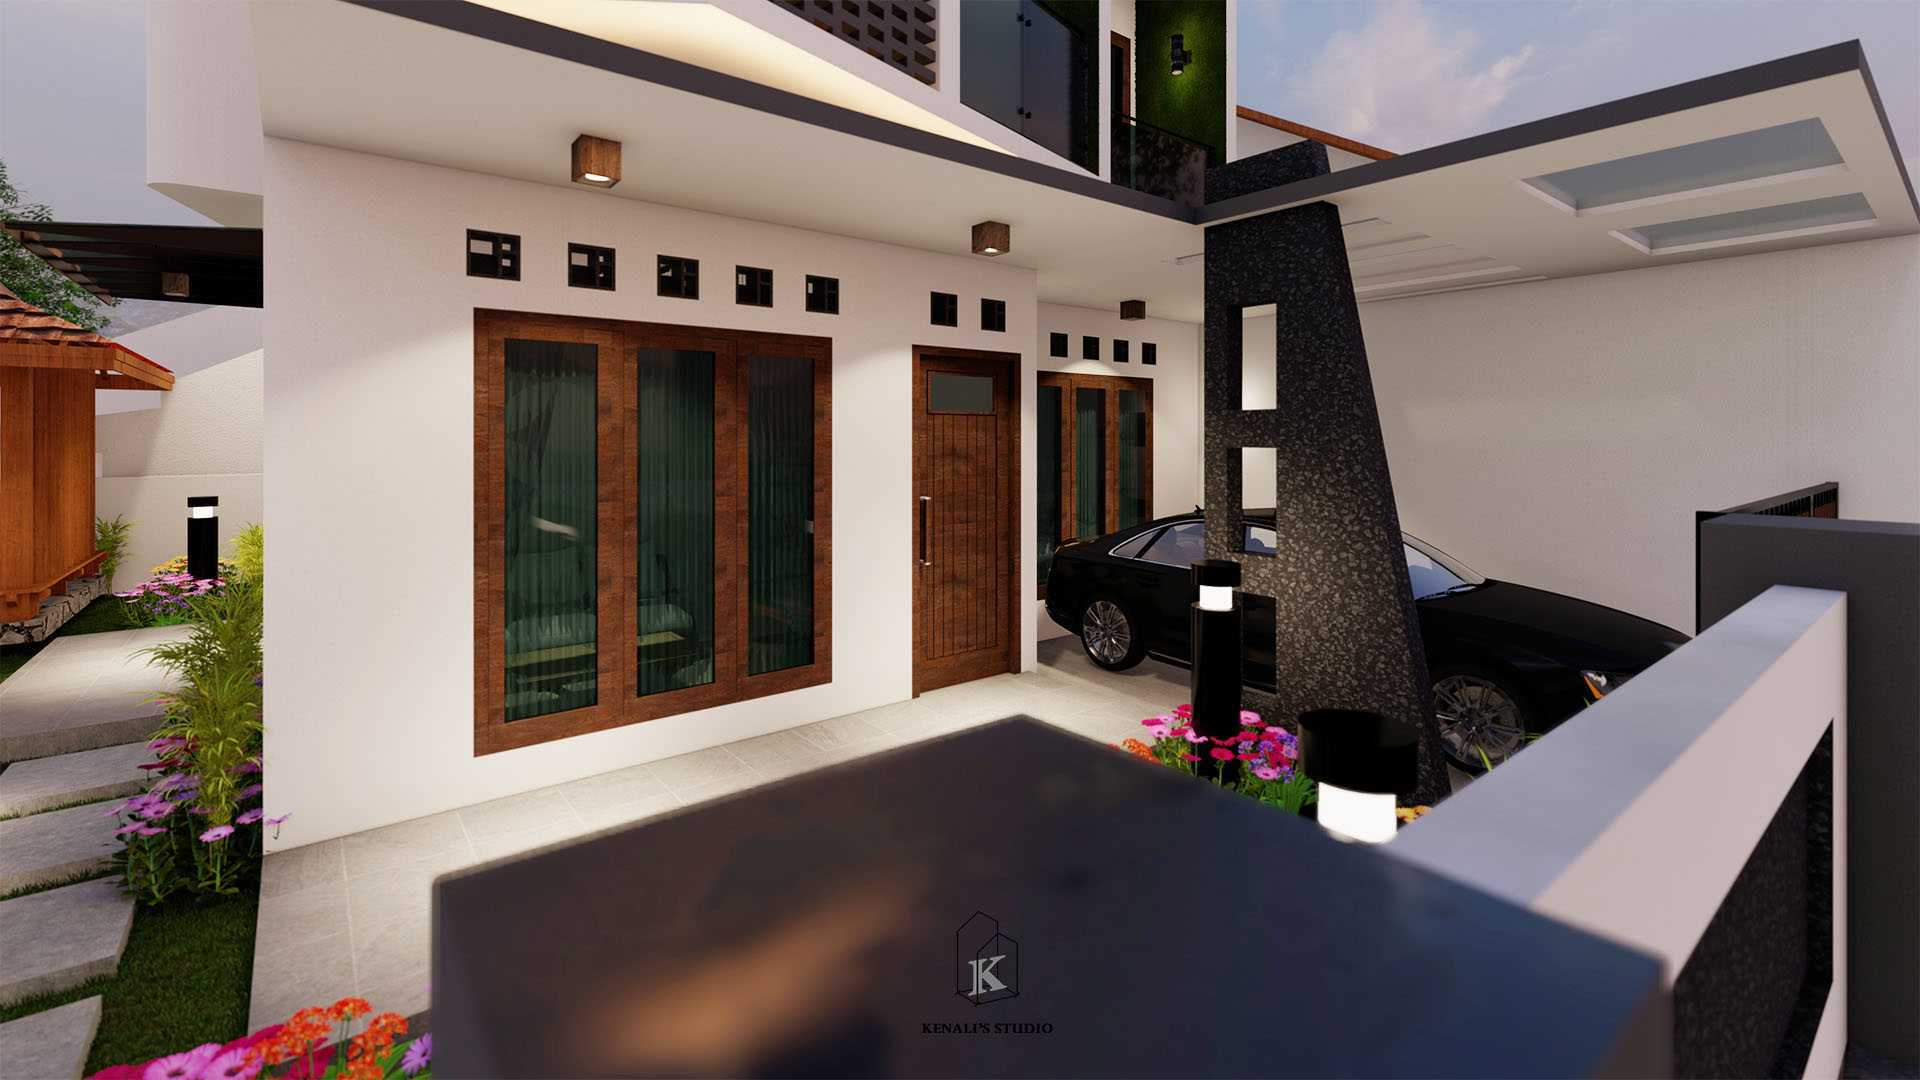 Kenali's Studio Yr - House Kec. Serpong, Kota Tangerang Selatan, Banten, Indonesia Kec. Serpong, Kota Tangerang Selatan, Banten, Indonesia Kenalis-Studio-Yr-House Contemporary  93645